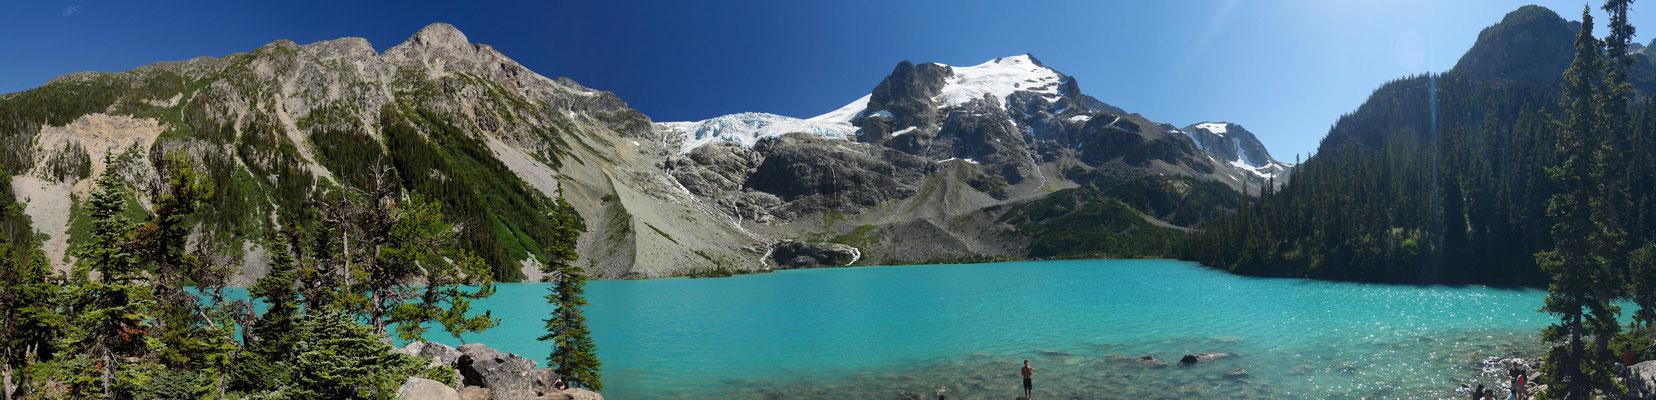 Panorama am dritten See